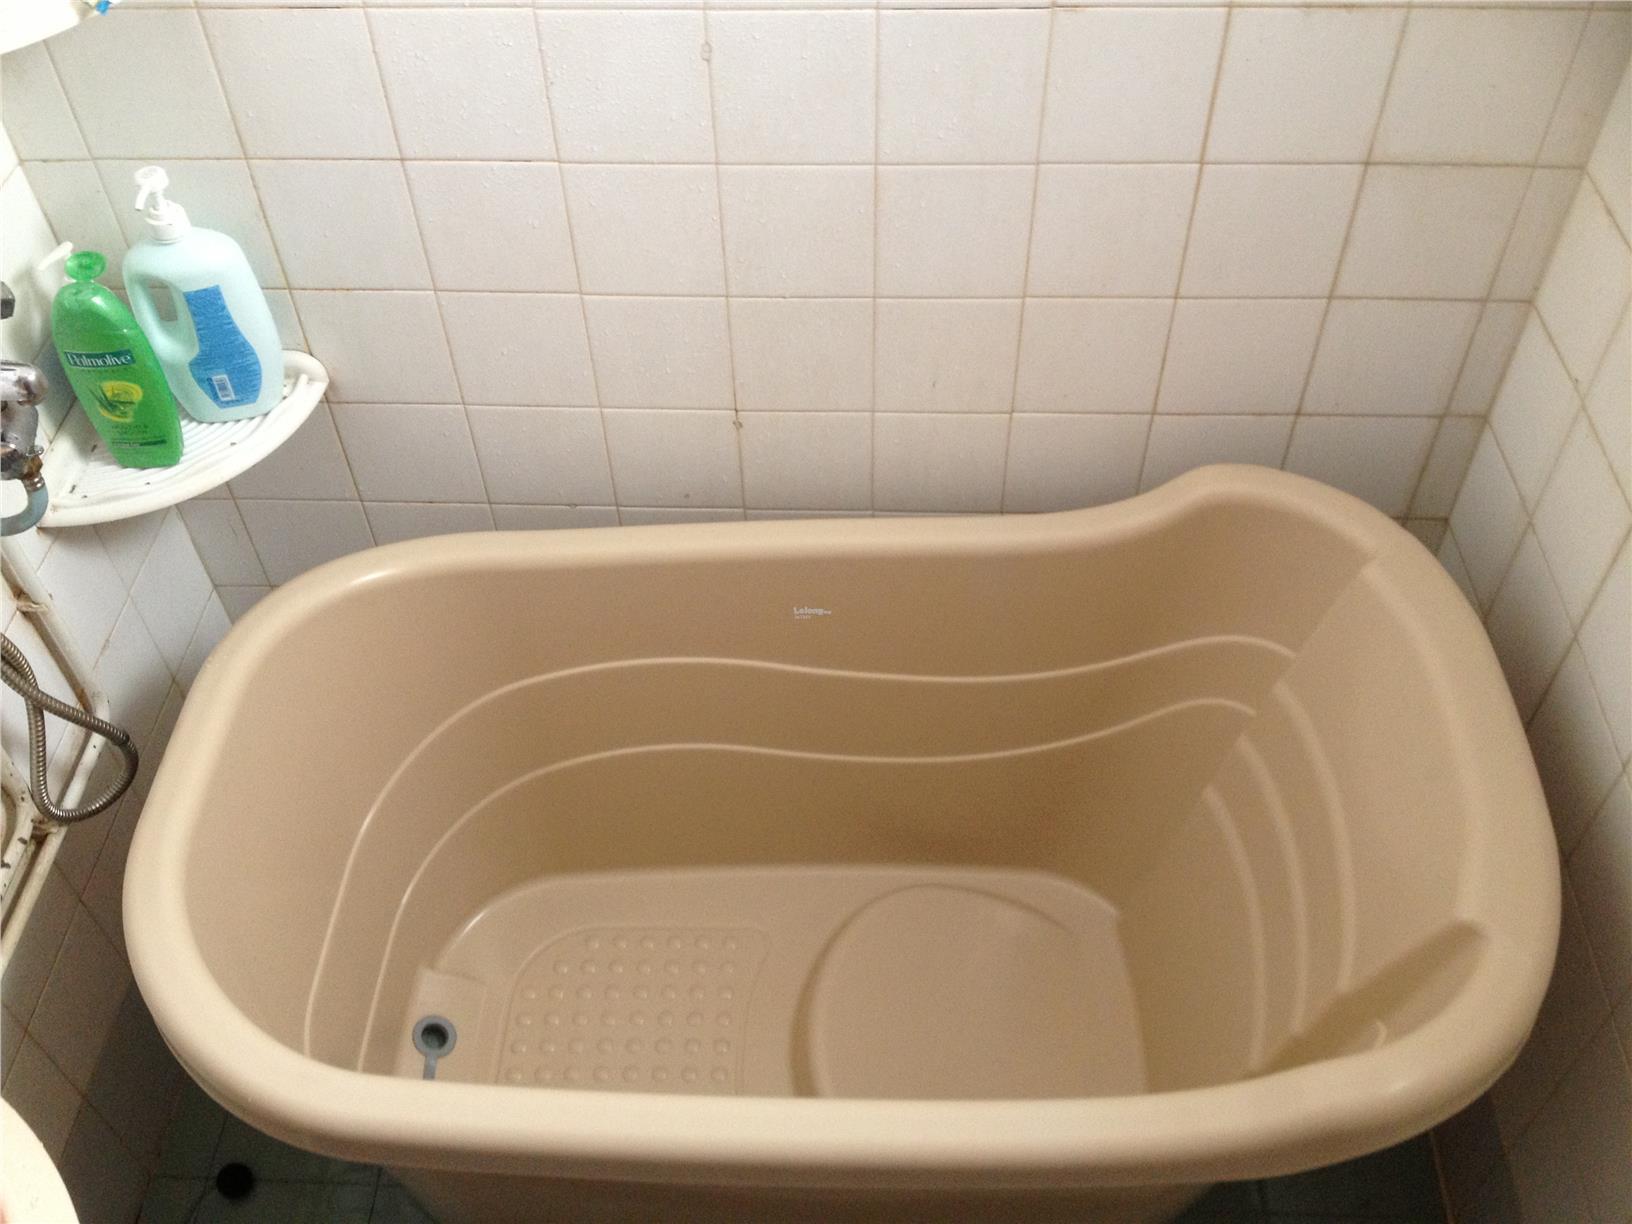 Lovely Portable Bathtub Durable Hot Cold So (end 4/21/2017 7:46 AM) TX57